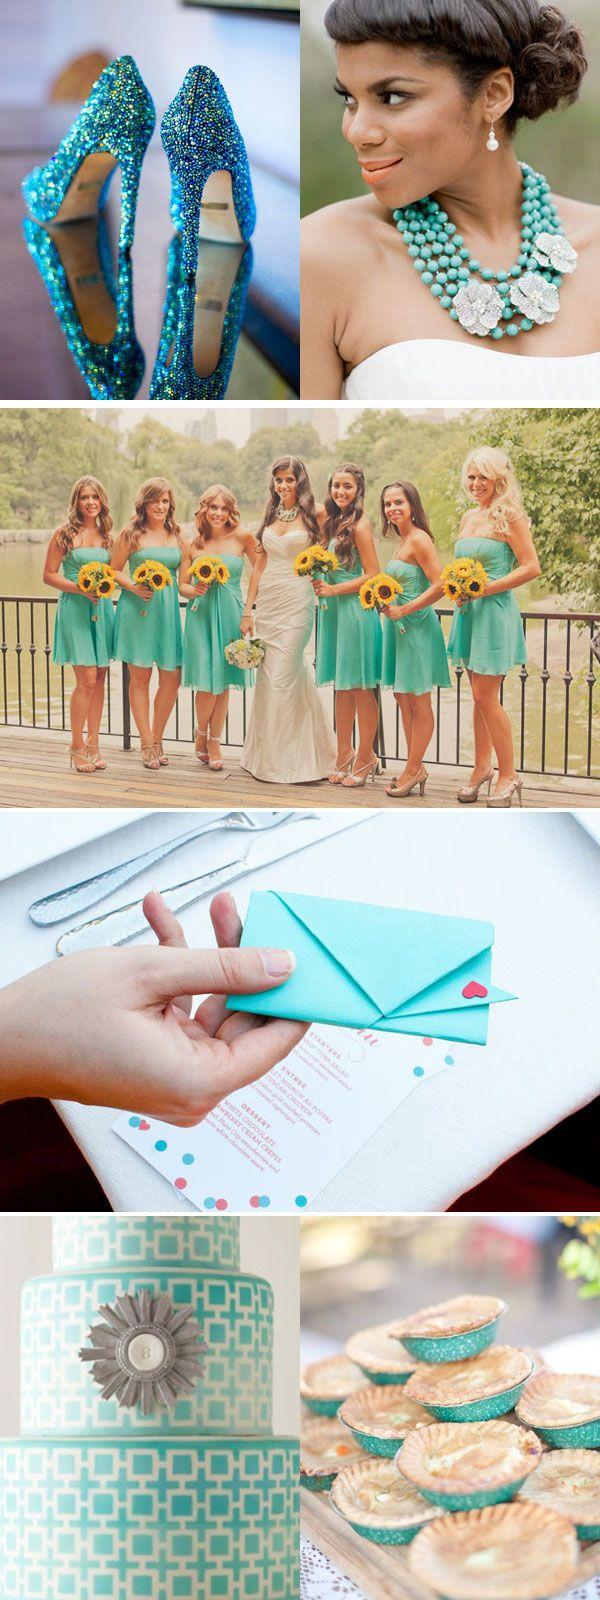 LOVE those bridesmaid dresses!!!